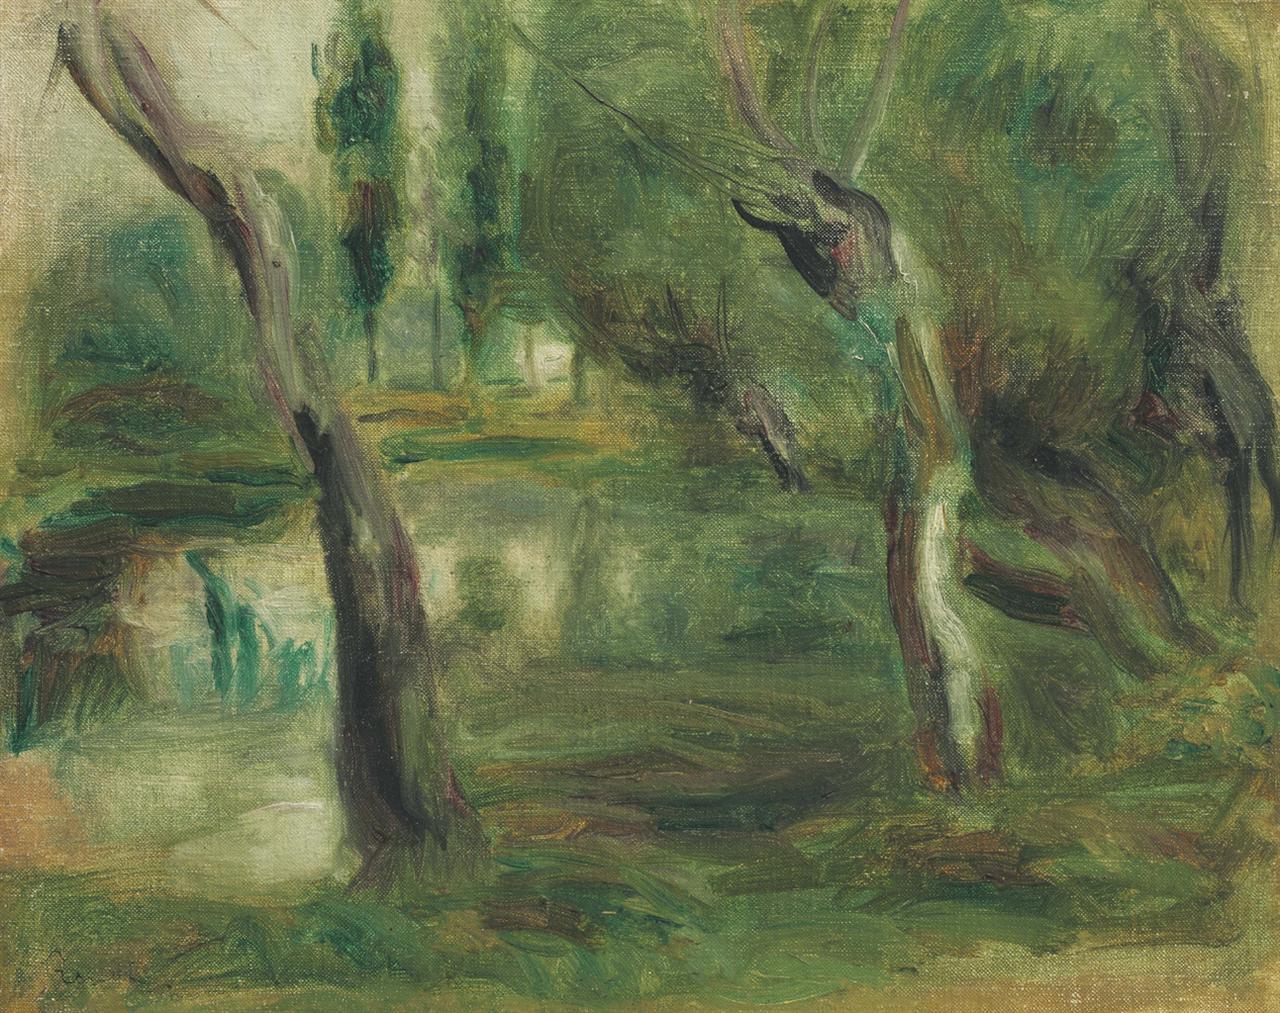 Pierre-Auguste Renoir-Saule Au Bord Dune Mare-1874